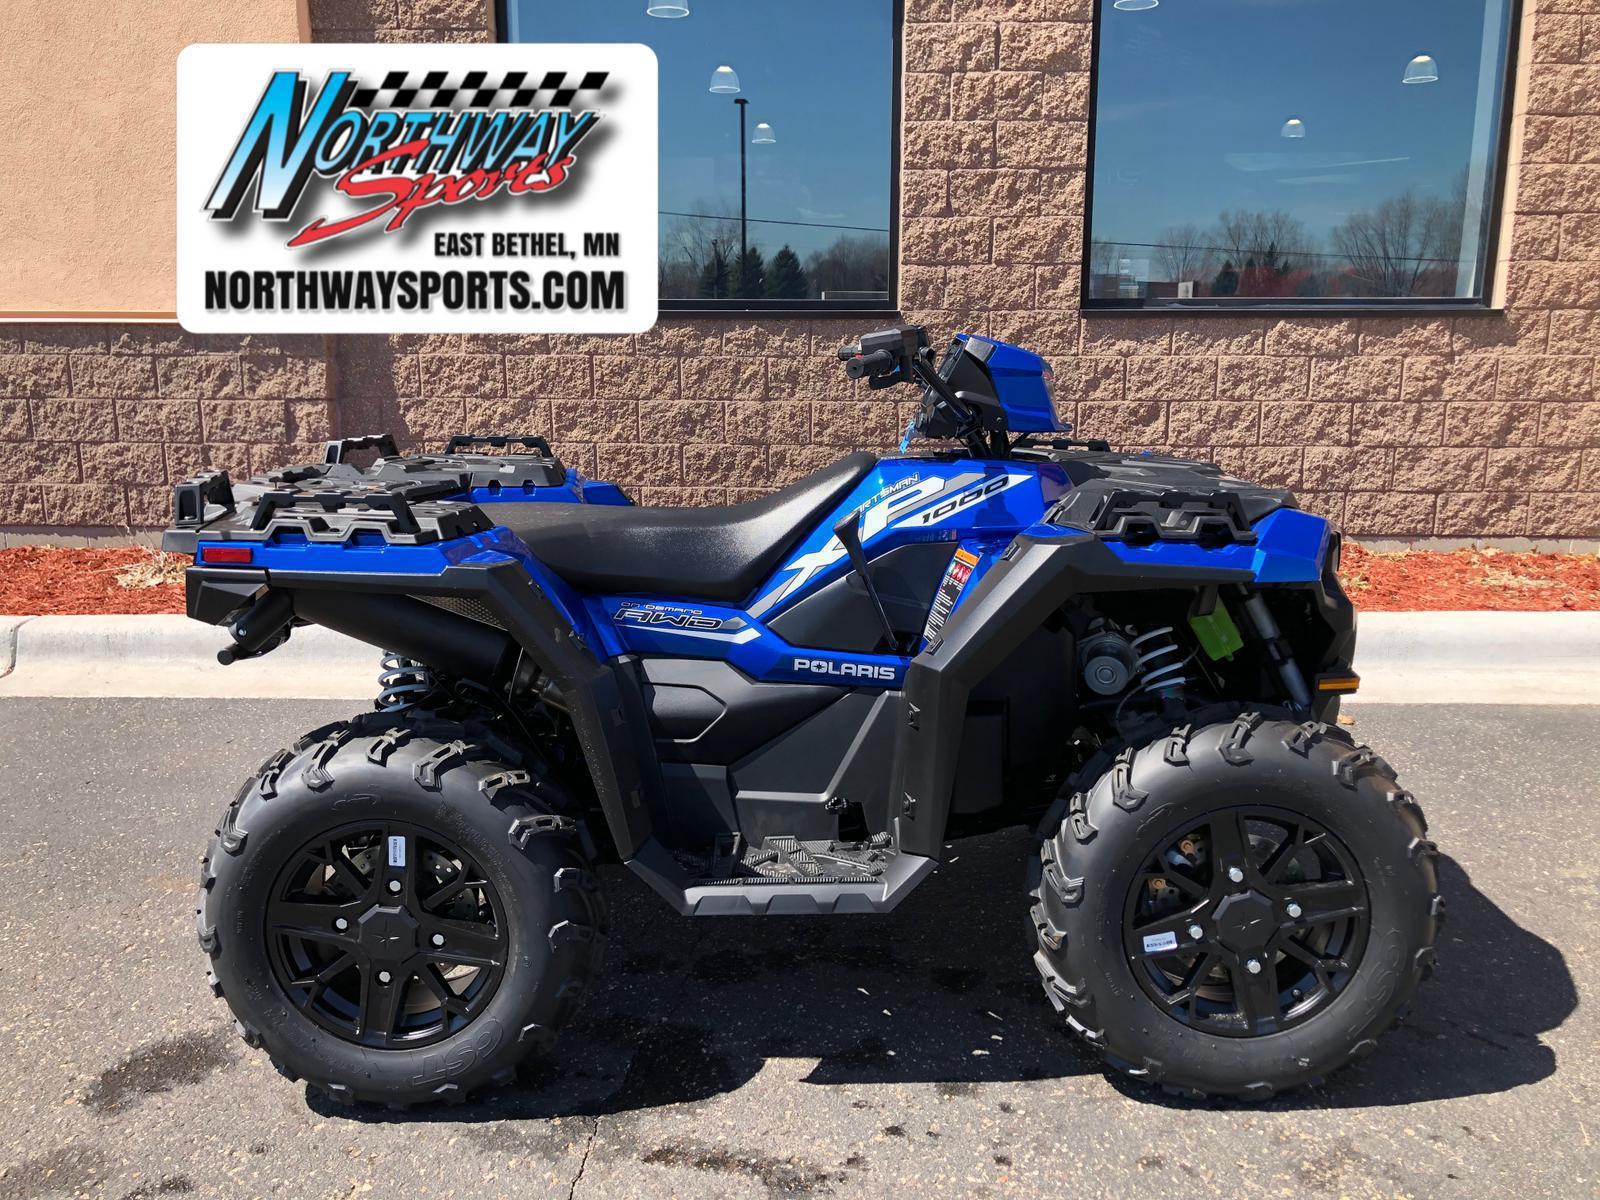 2019 Polaris Industries Sportsman® XP 1000 - Radar Blue